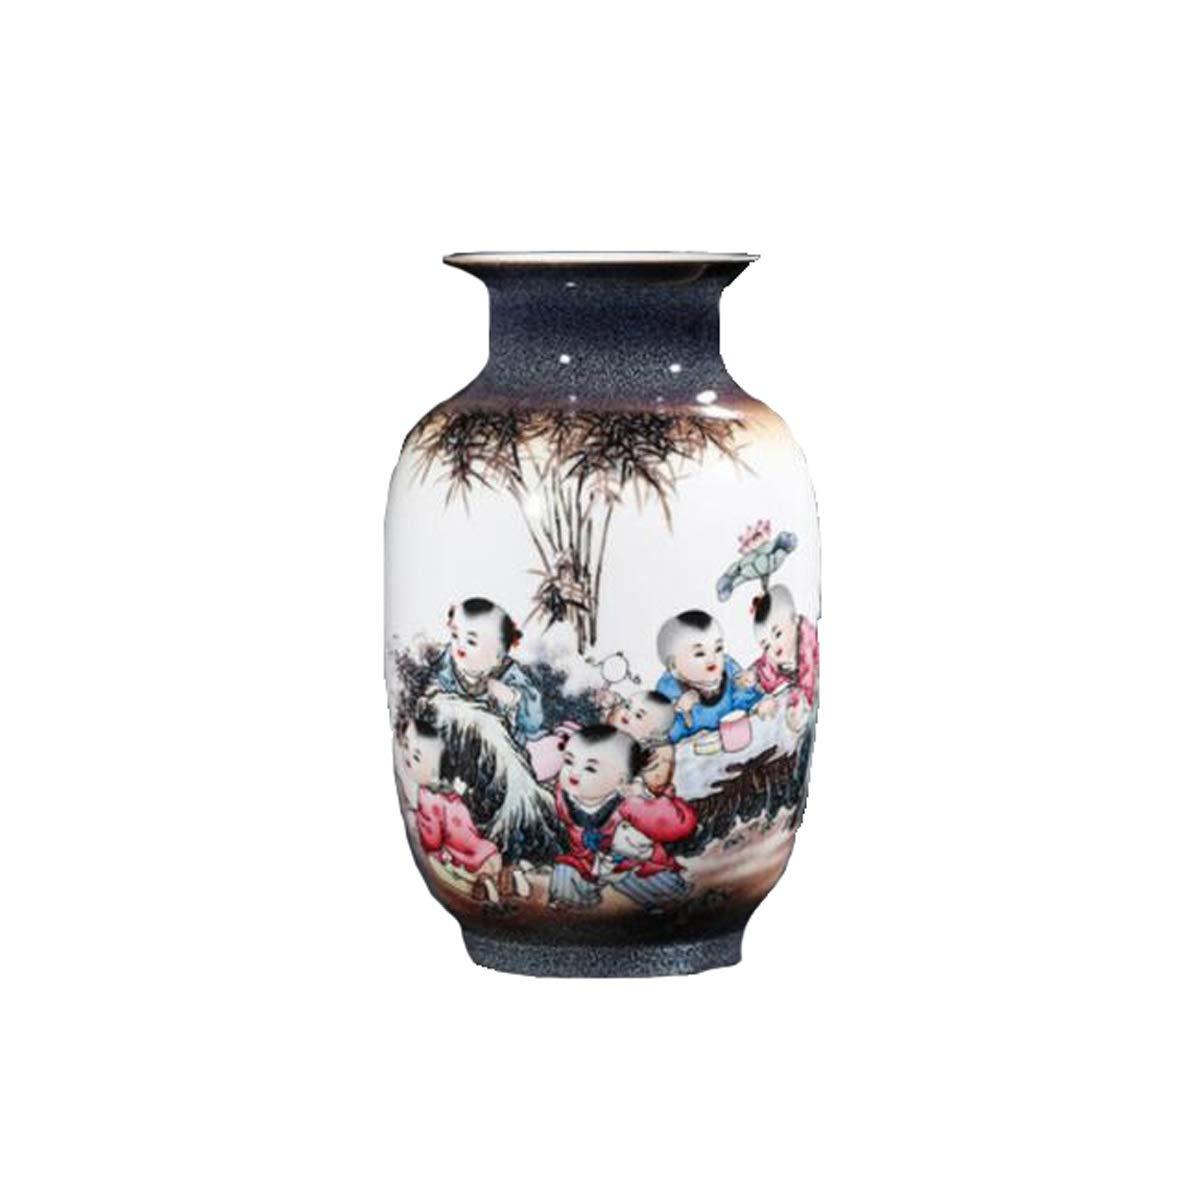 SHENGSHIHUIZHONG 花瓶の装飾、景徳鎮セラミックス、クリエイティブキルン色インクボーイ花瓶、フラワーインサート、中国の家の装飾工芸品装飾的な装飾品、男の子、通常の包装とギフトボックスセット2つのスタイル 中華風 (Edition : B) B07SWZR7RN  B